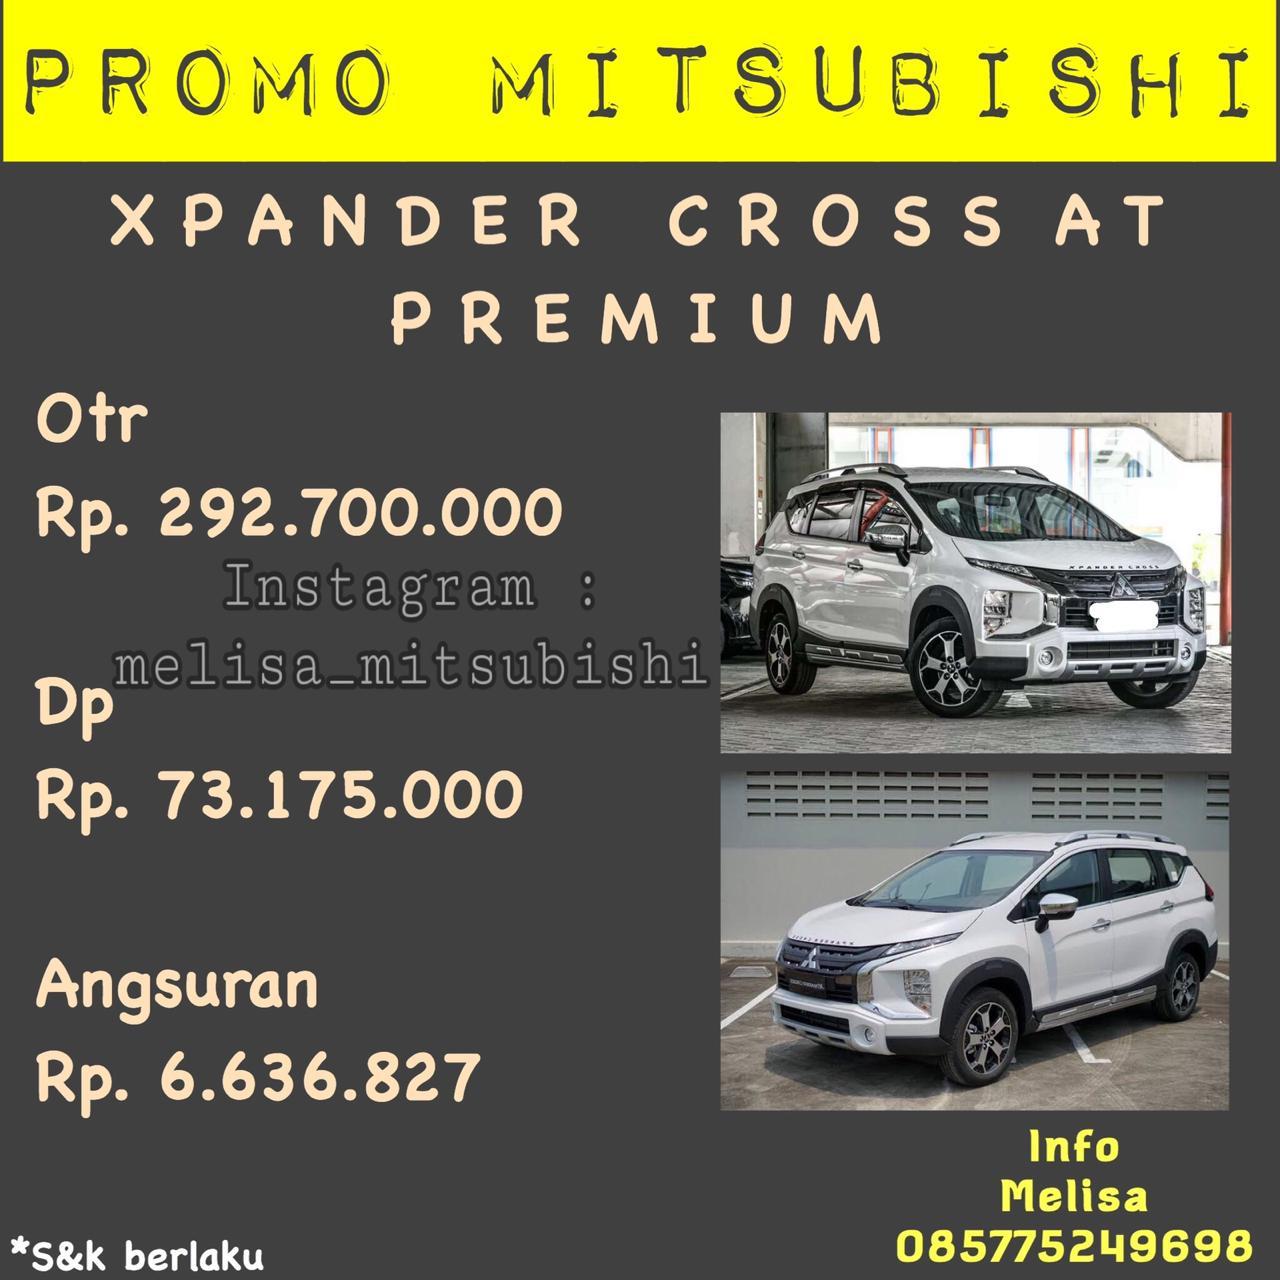 Promo Mitsubishi Xpander Cross Melisa Mitsubishi Jakarta Selatan